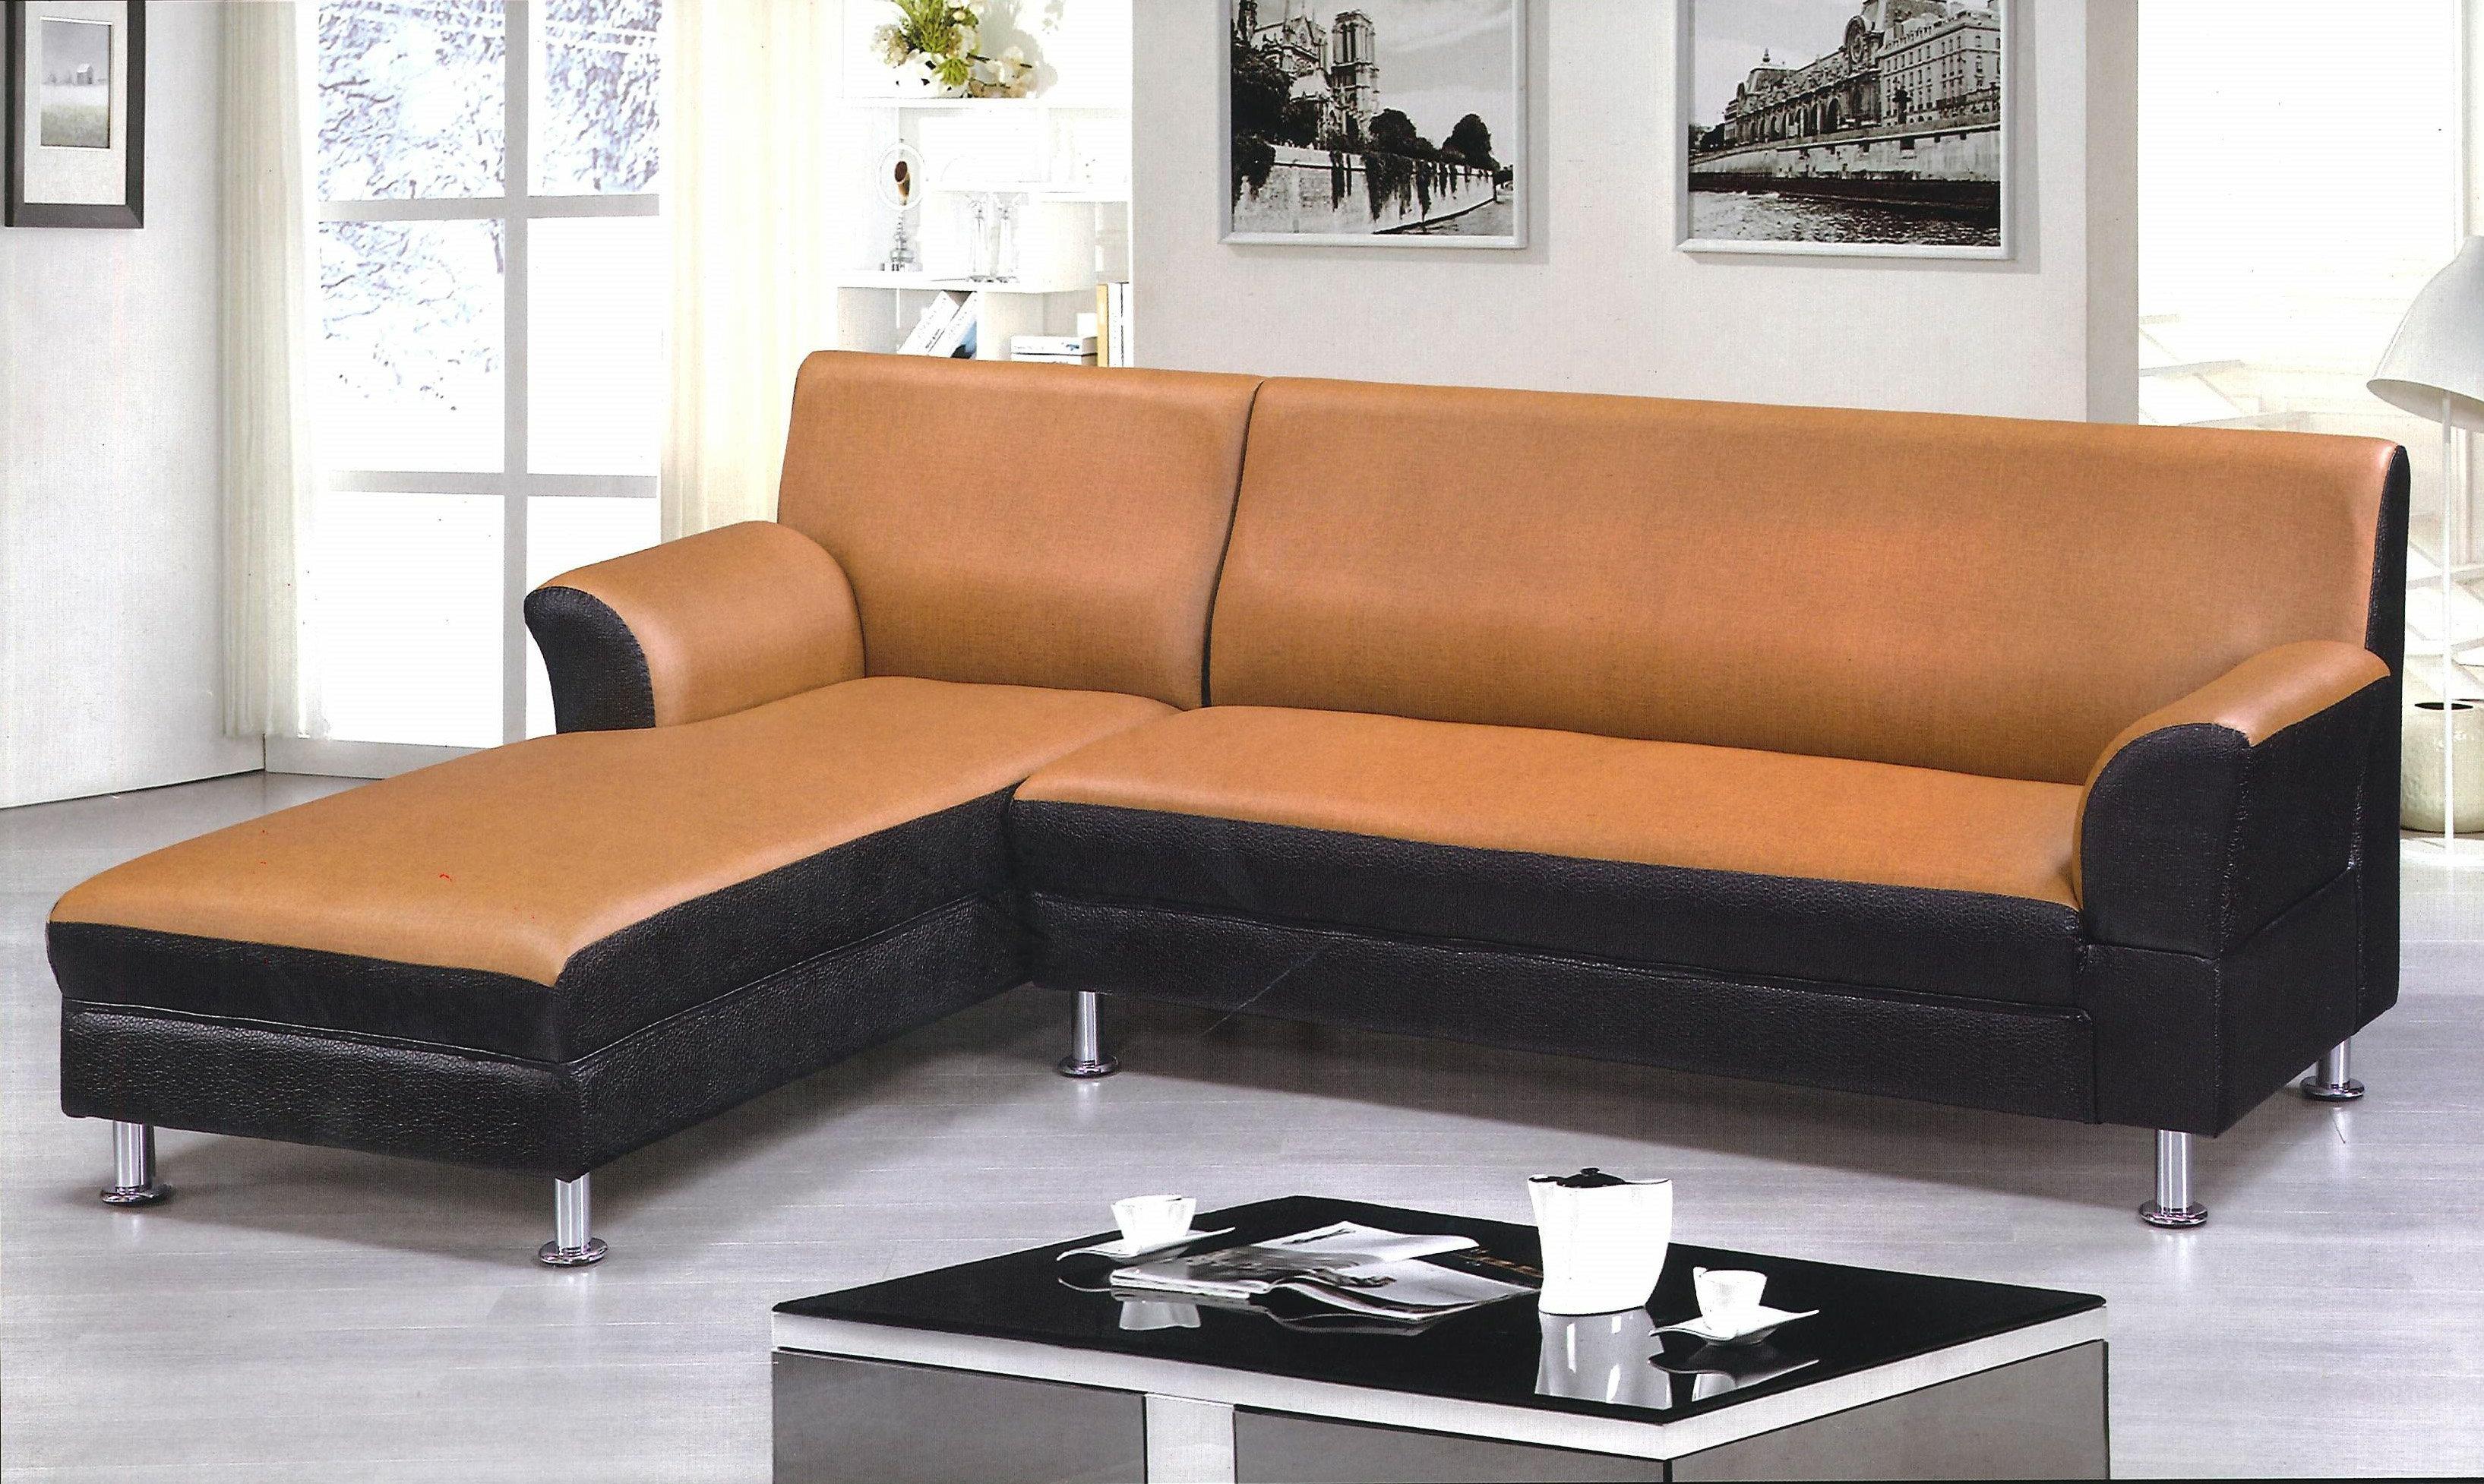 【MSL】英式簡約皮面L型沙發 - 限時優惠好康折扣